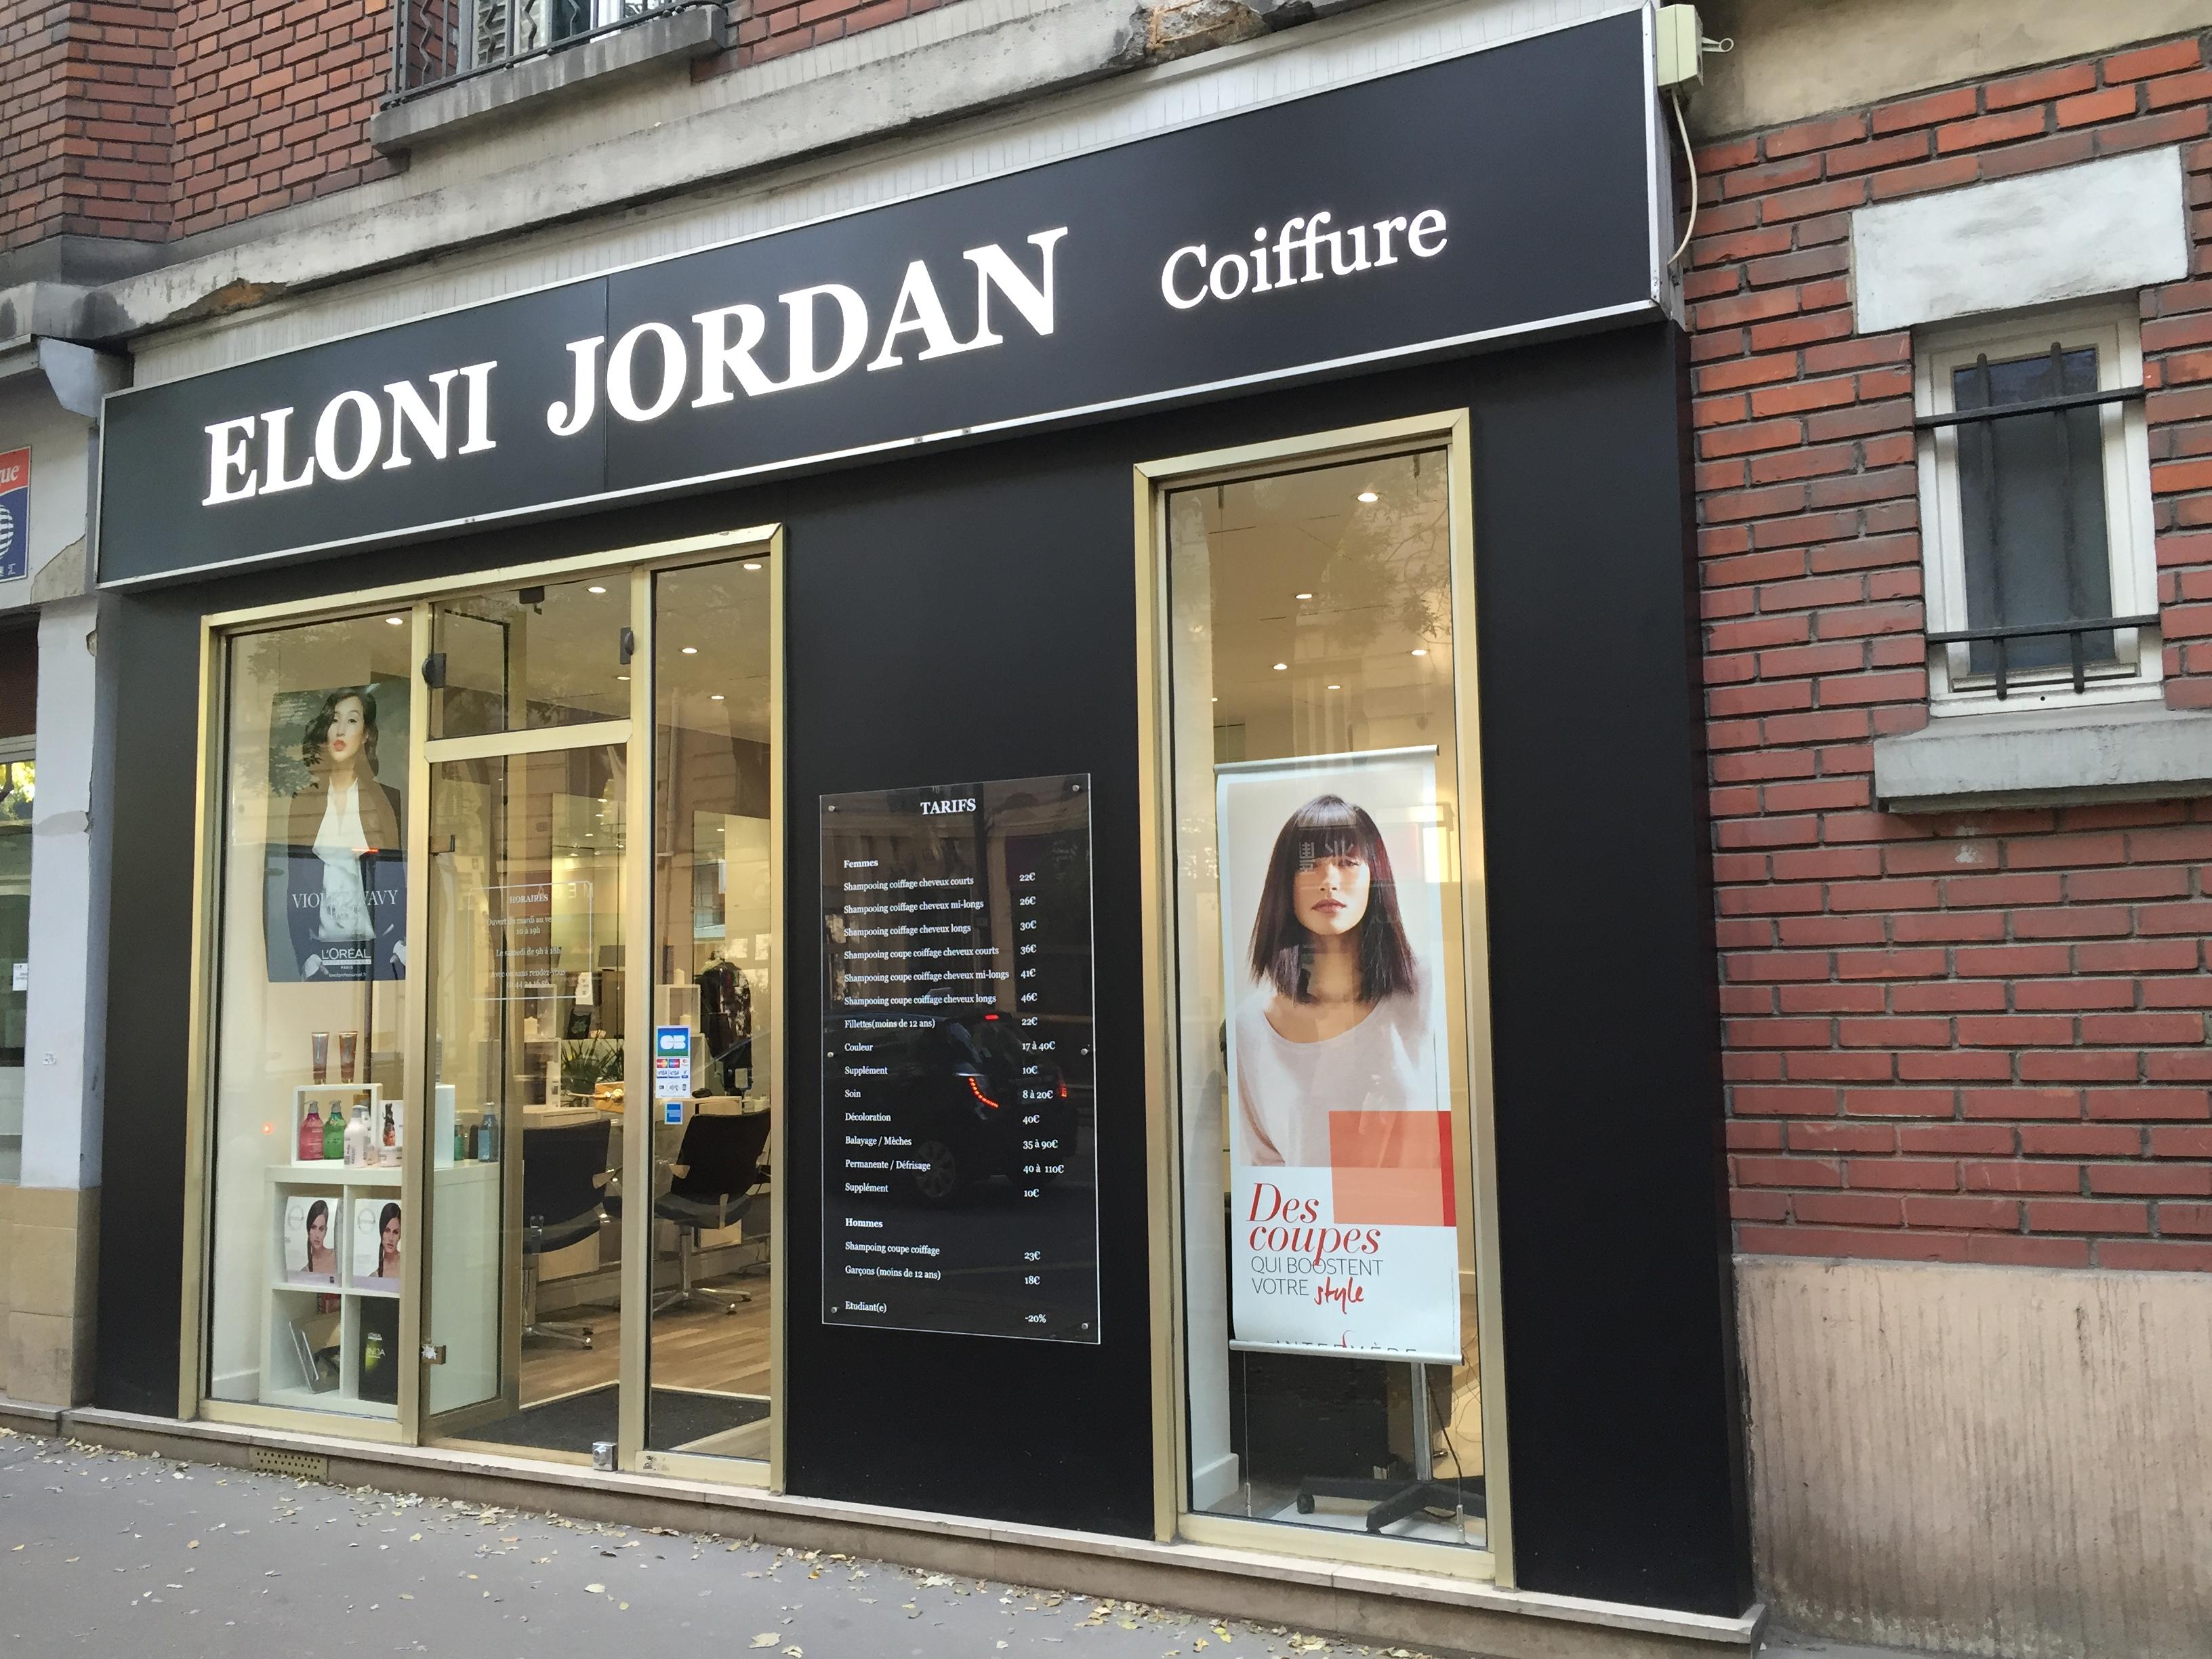 eloni jordan paris 13 avis tarifs horaires t l phone. Black Bedroom Furniture Sets. Home Design Ideas